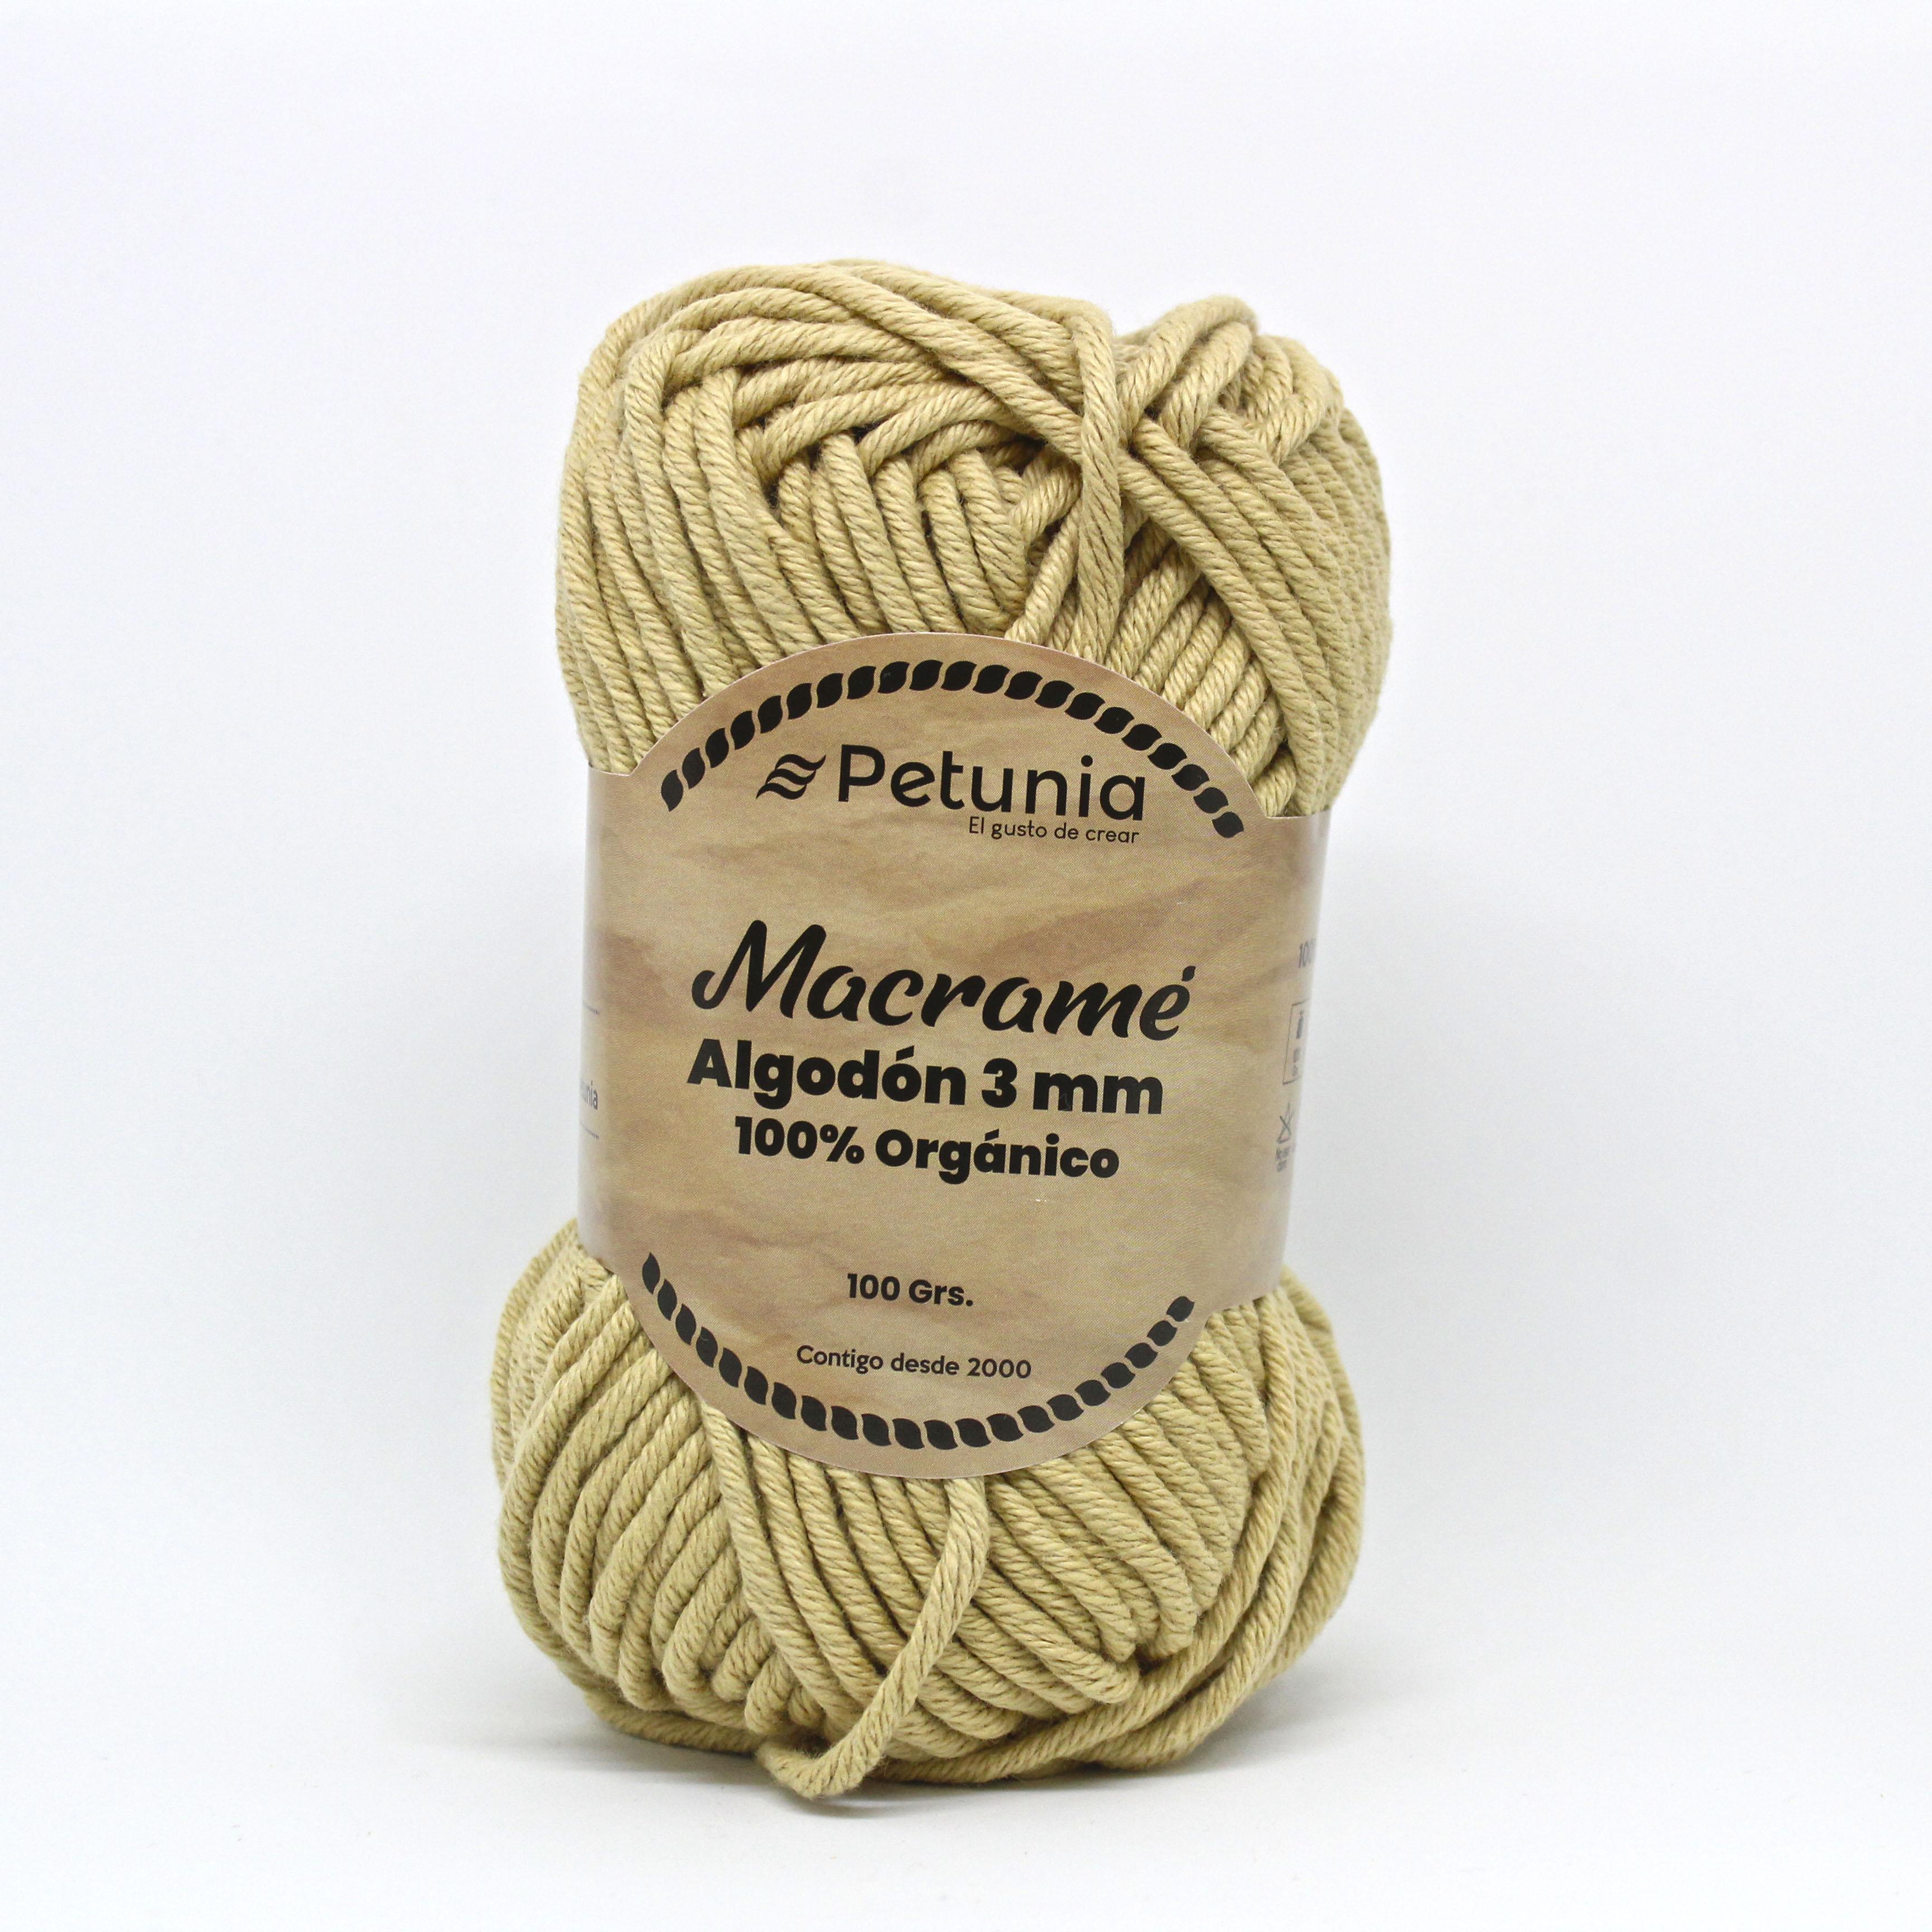 MACRAME ALGODON 3 MM - 6013